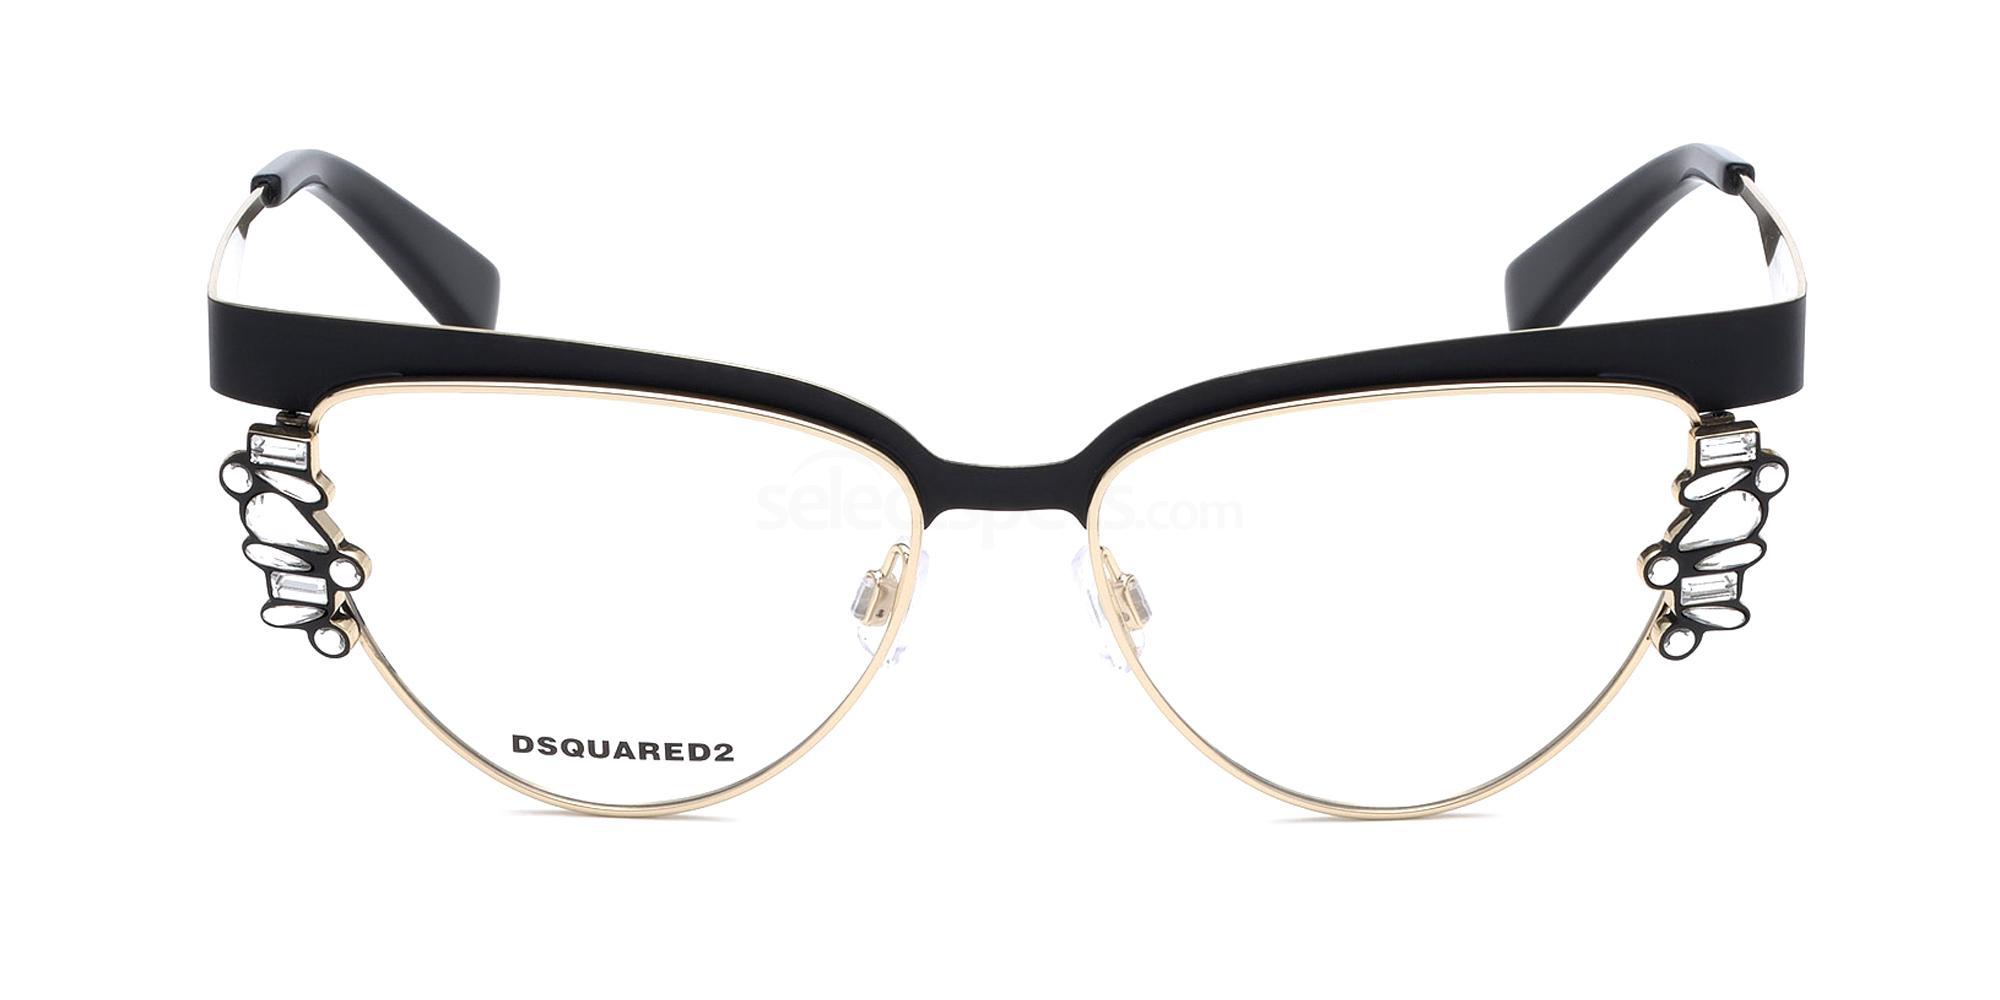 002 DQ5276 Glasses, DSQUARED2